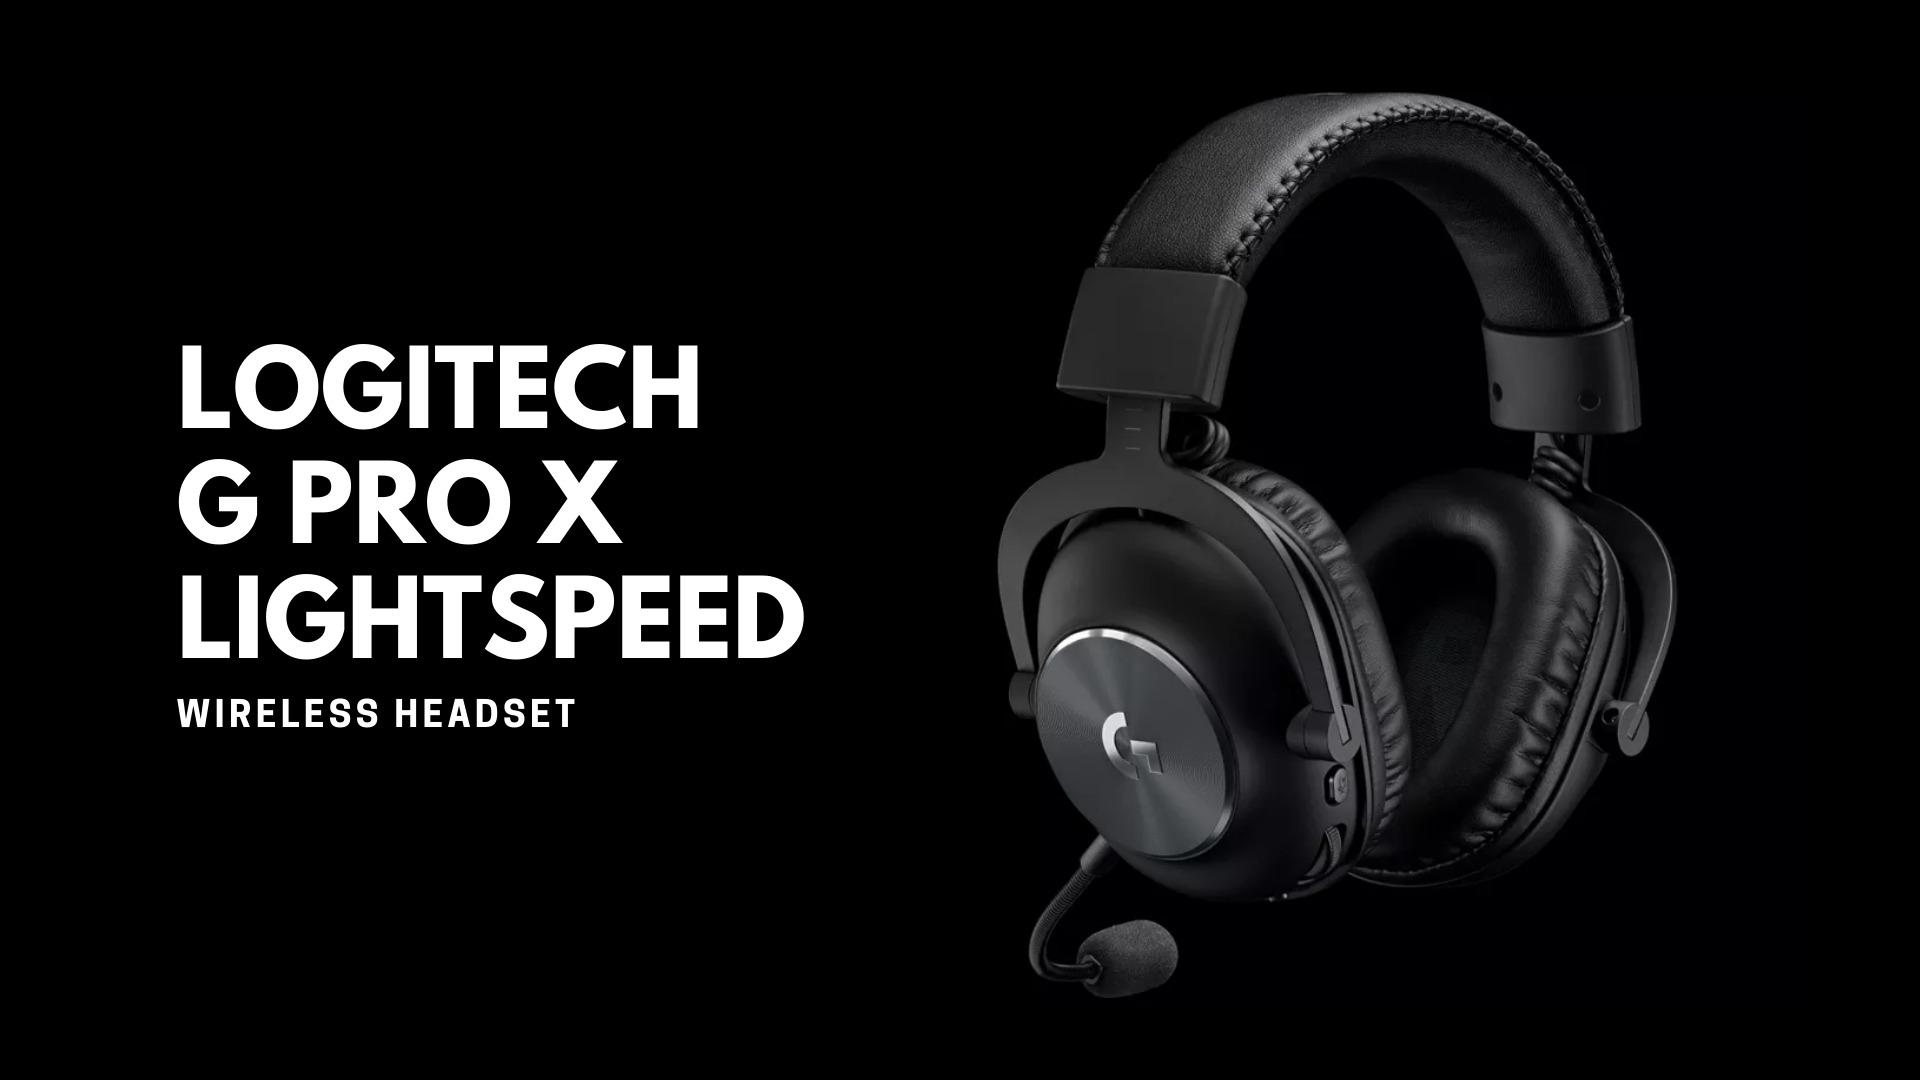 Logitech G PRO X LIGHTSPEED Wireless Headset